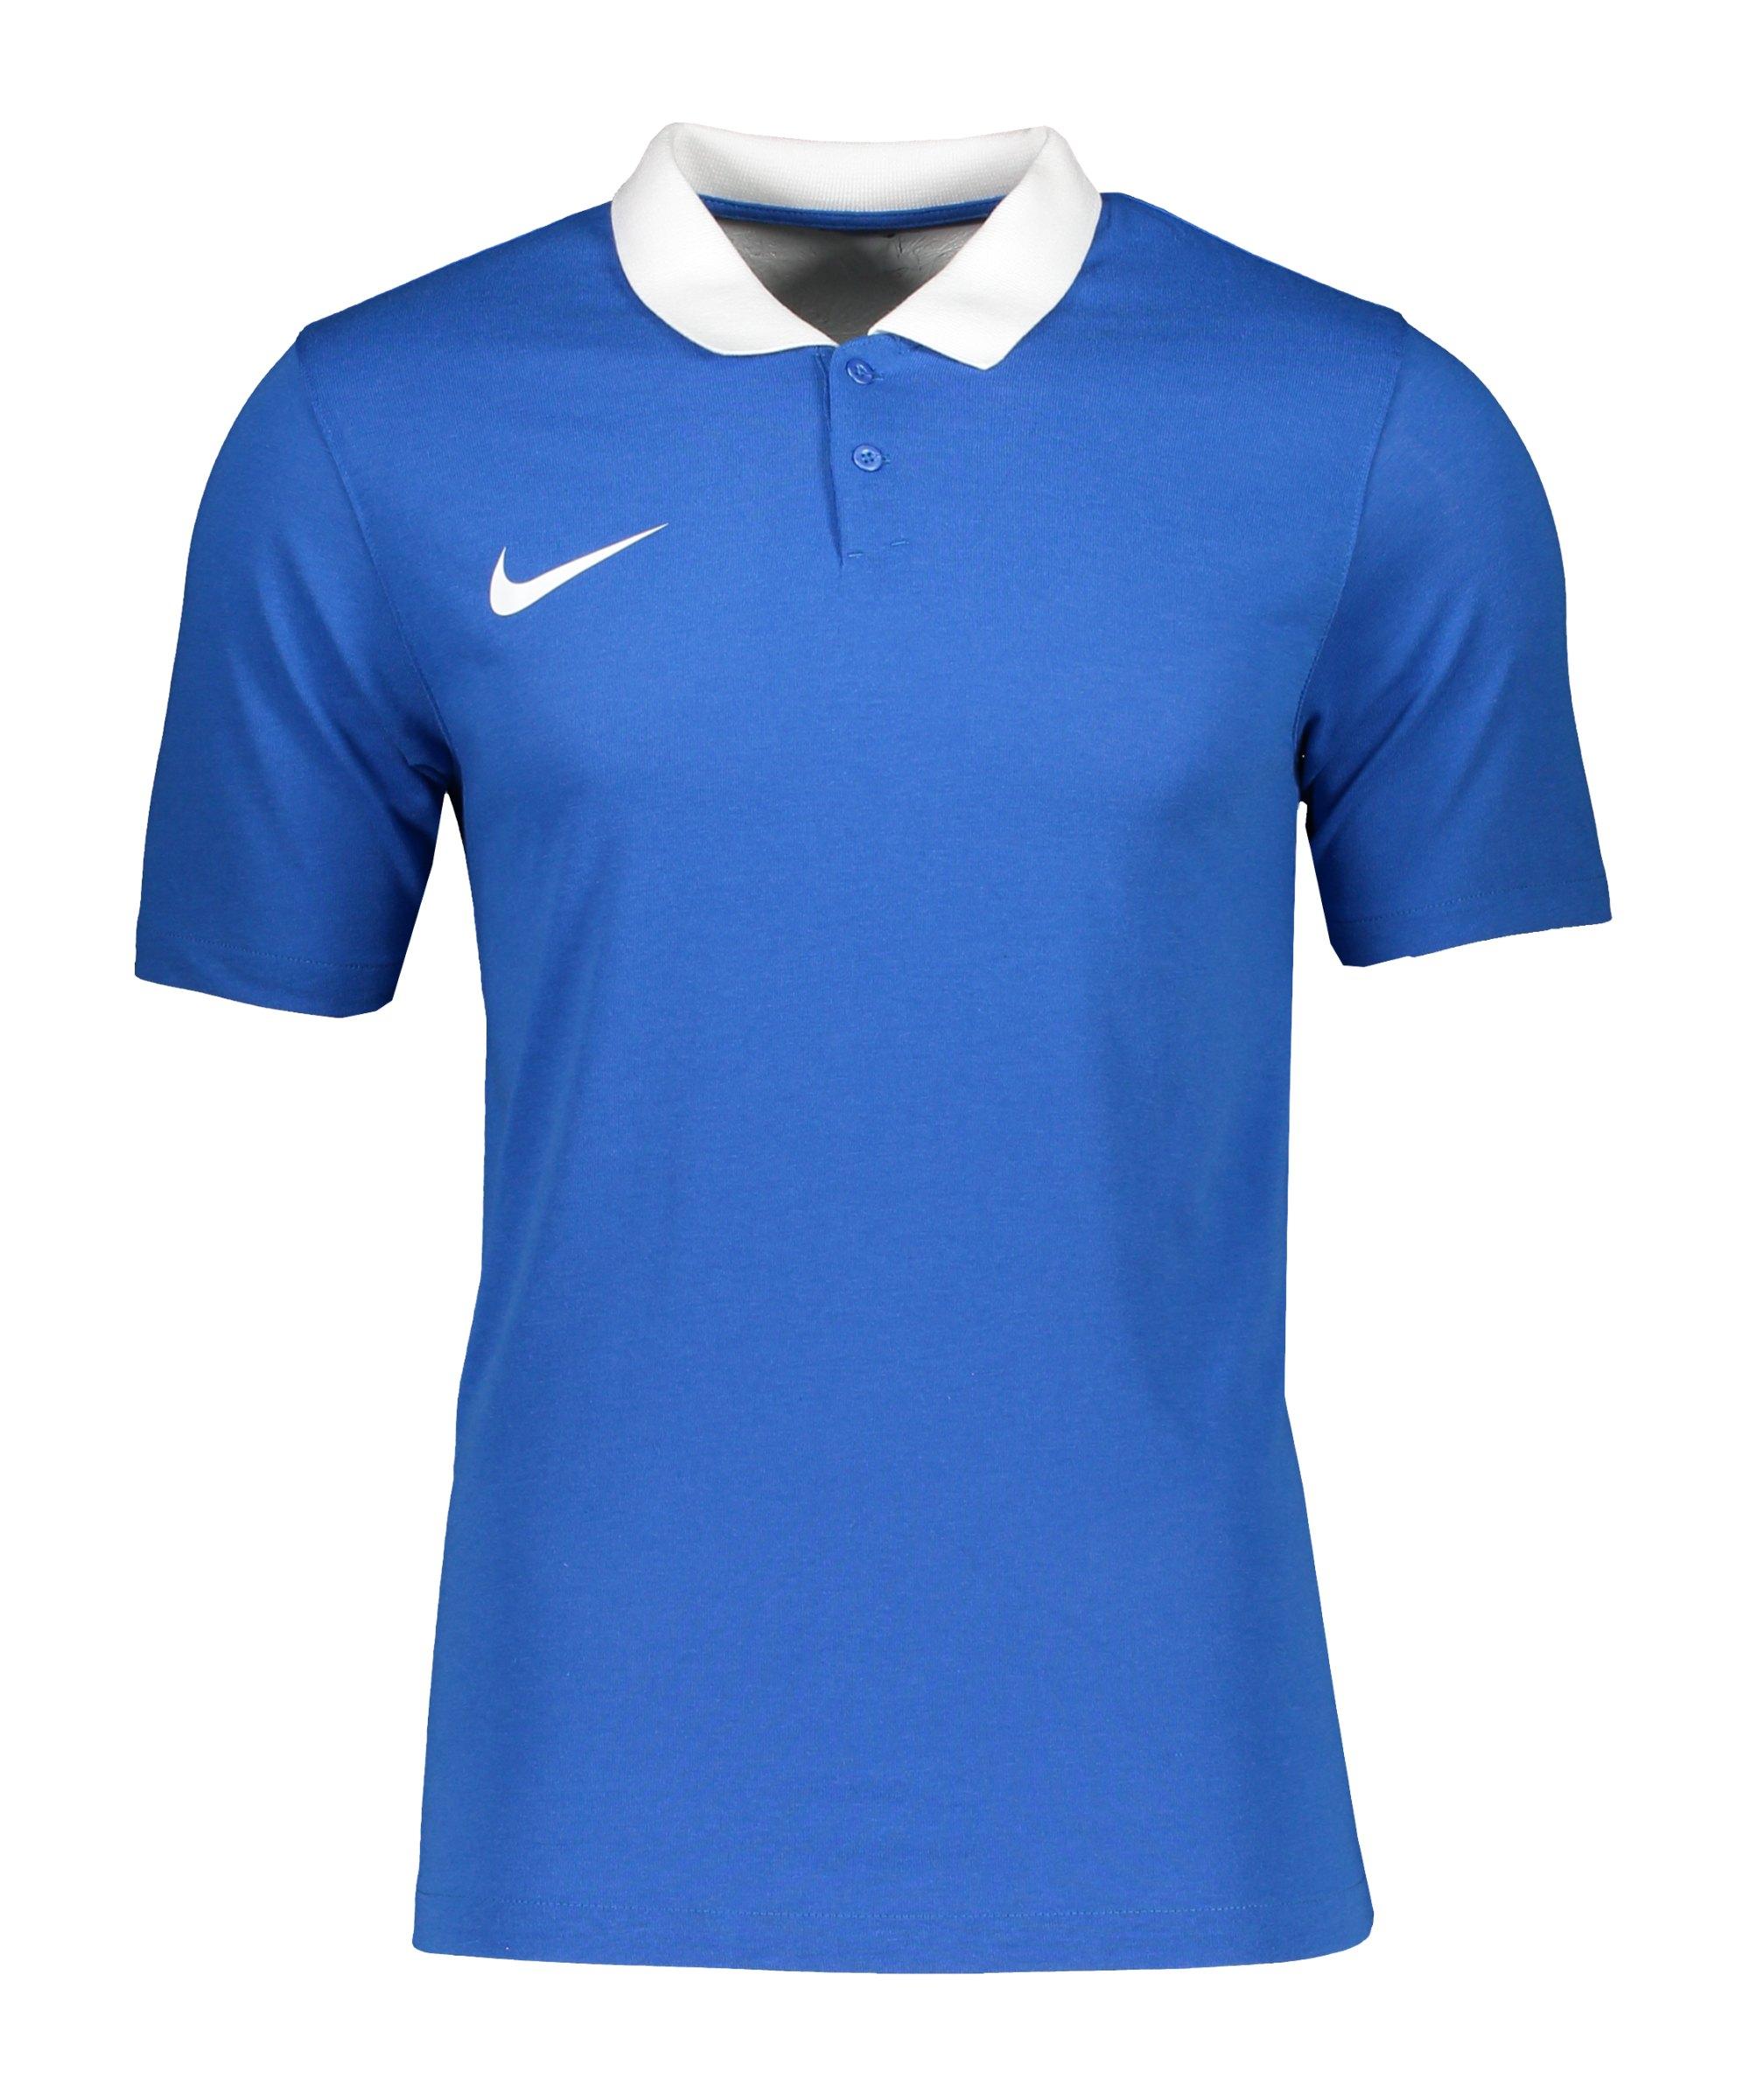 Nike Park 20 Poloshirt Kids Blau Weiss F463 - blau